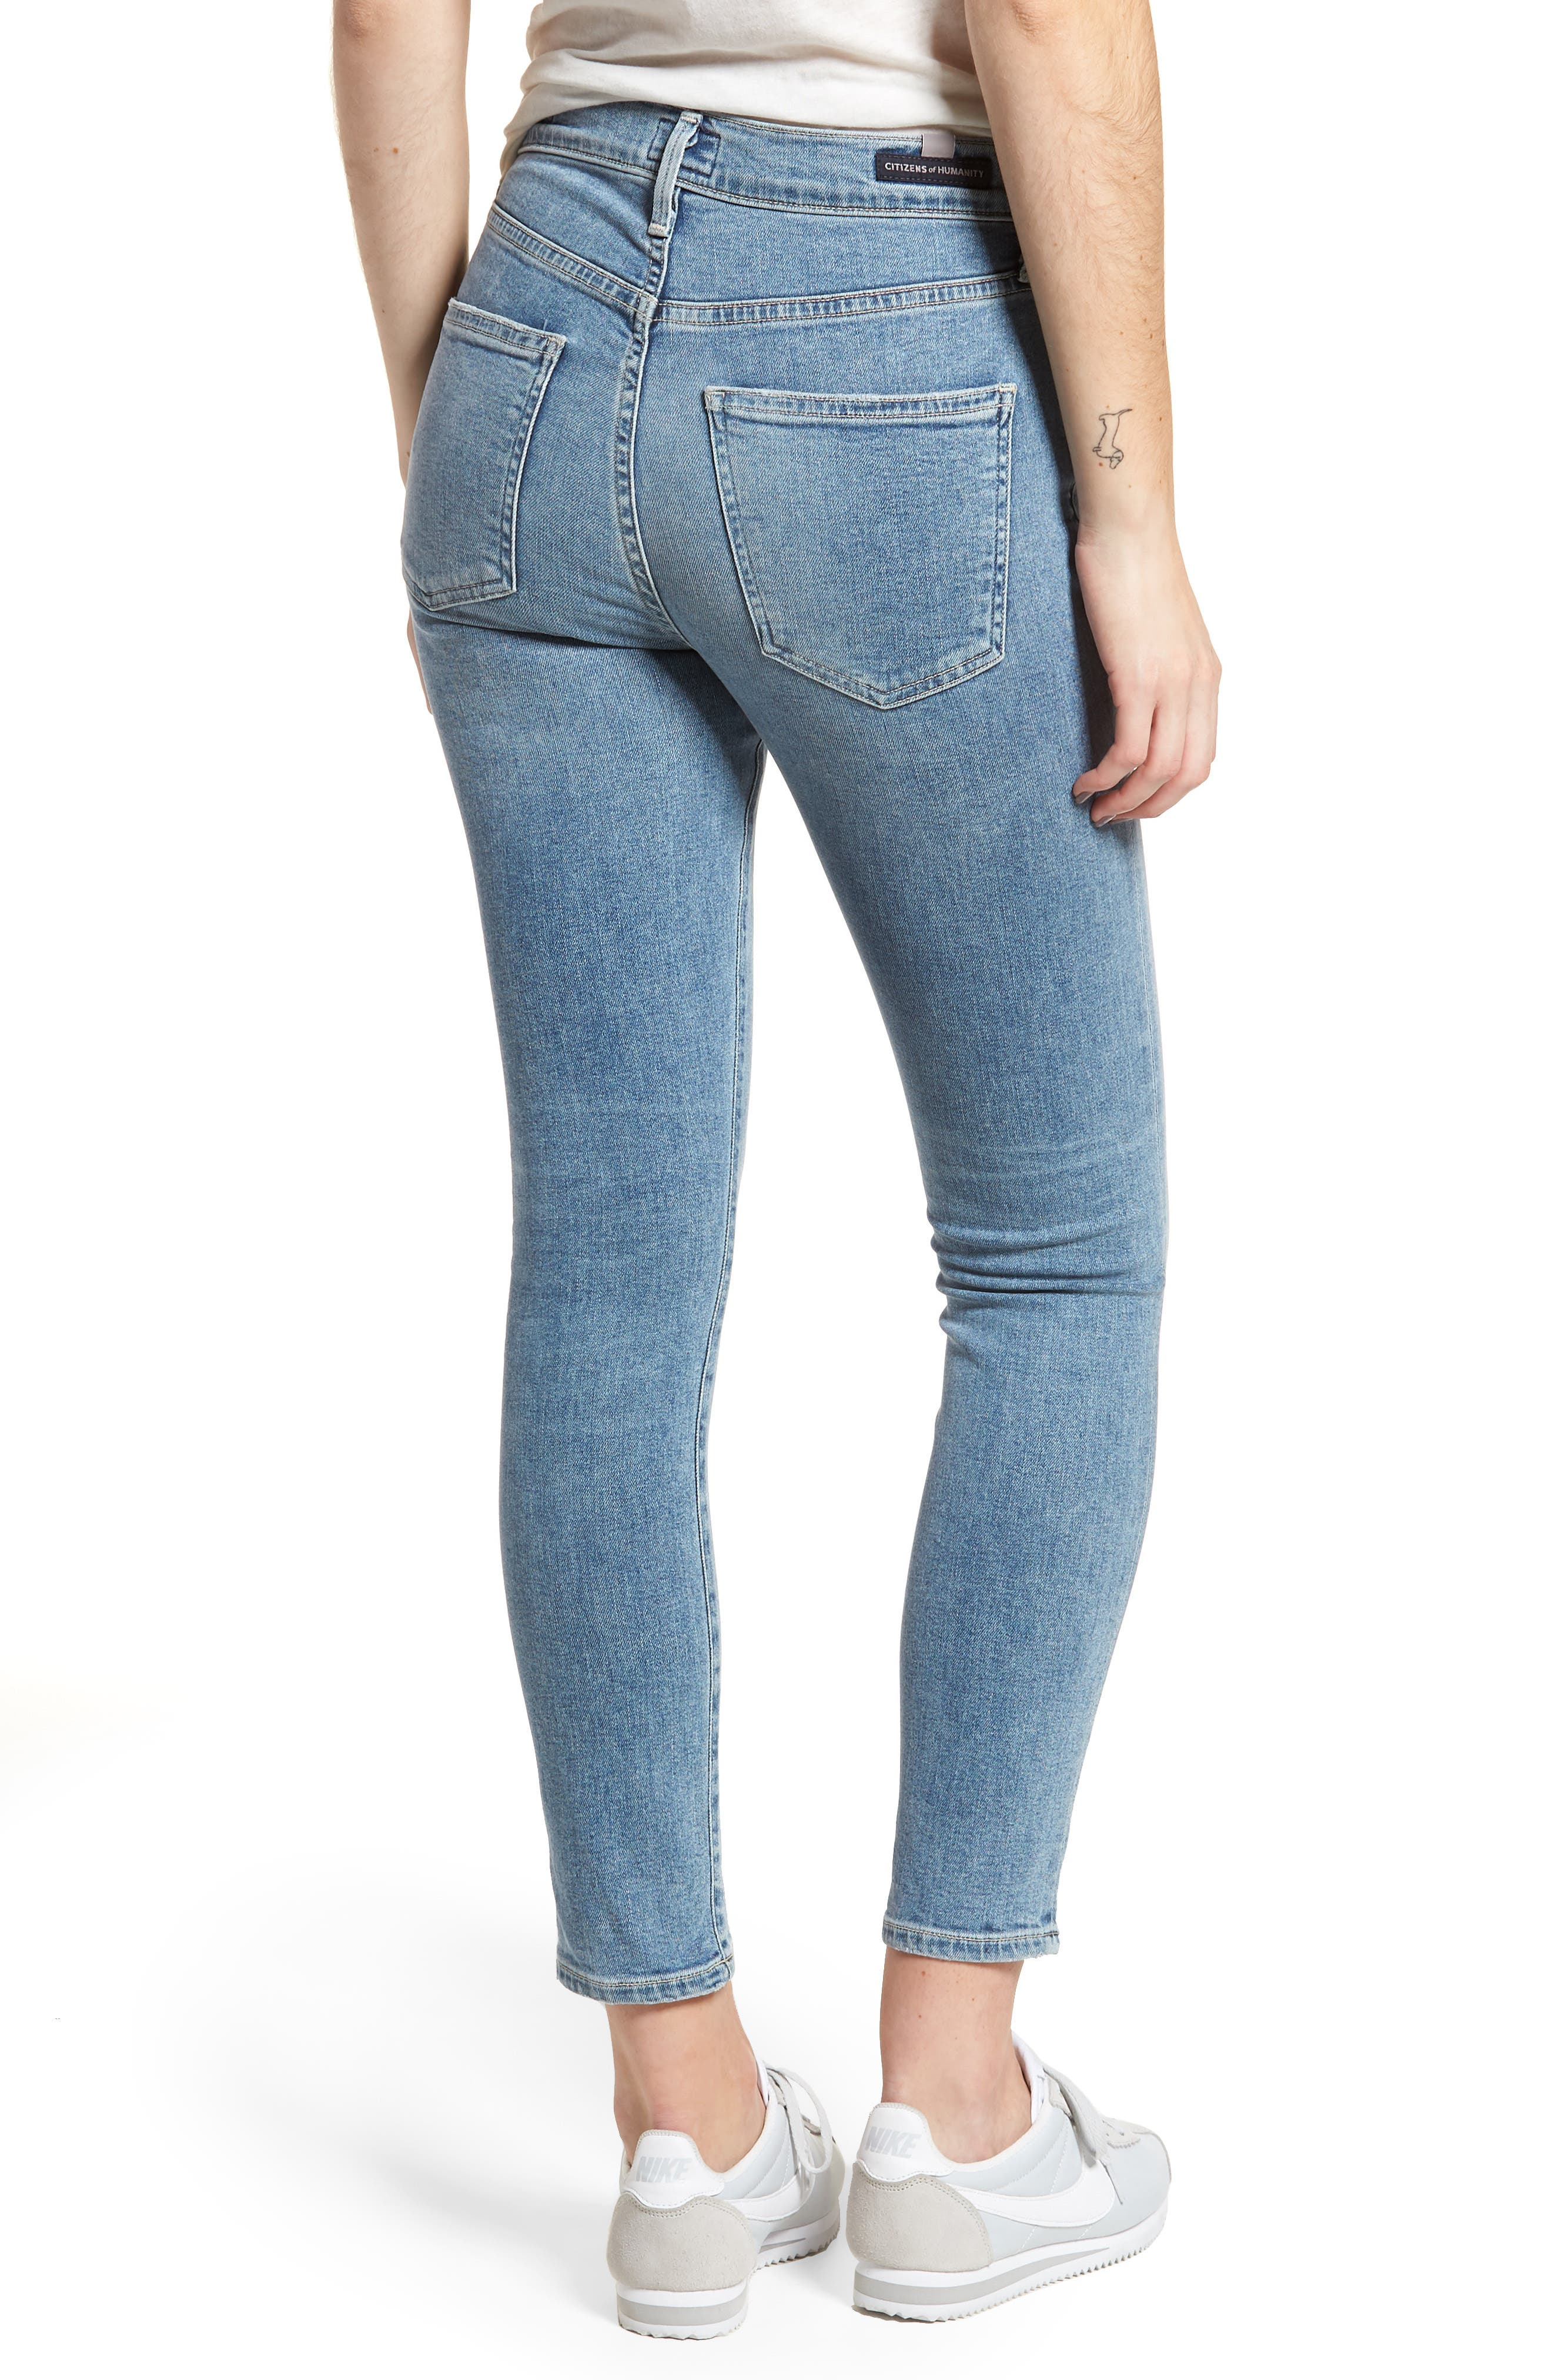 Rocket High Waist Crop Skinny Jeans,                             Alternate thumbnail 2, color,                             Firestone